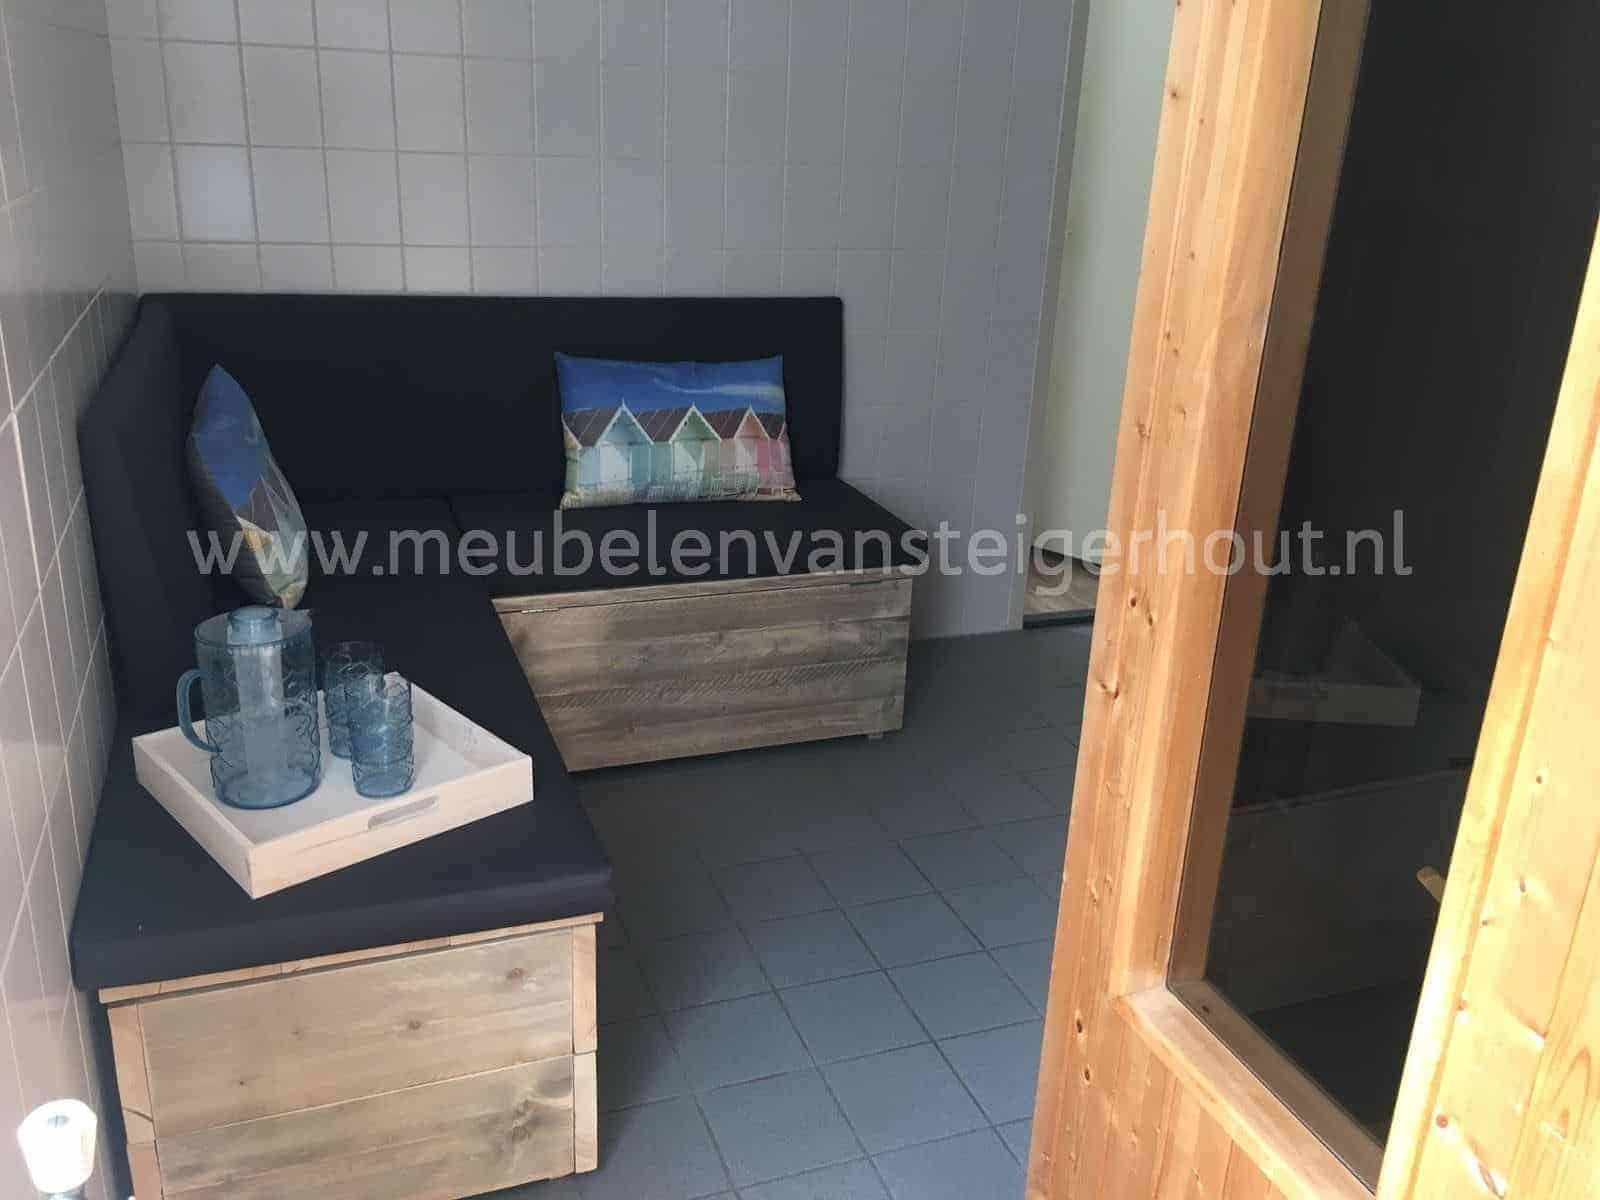 Steigerhout Meubel Kussens.Kist Steigerhout Met Kussens Het Gooi2 Meubelen Van Steigerhout